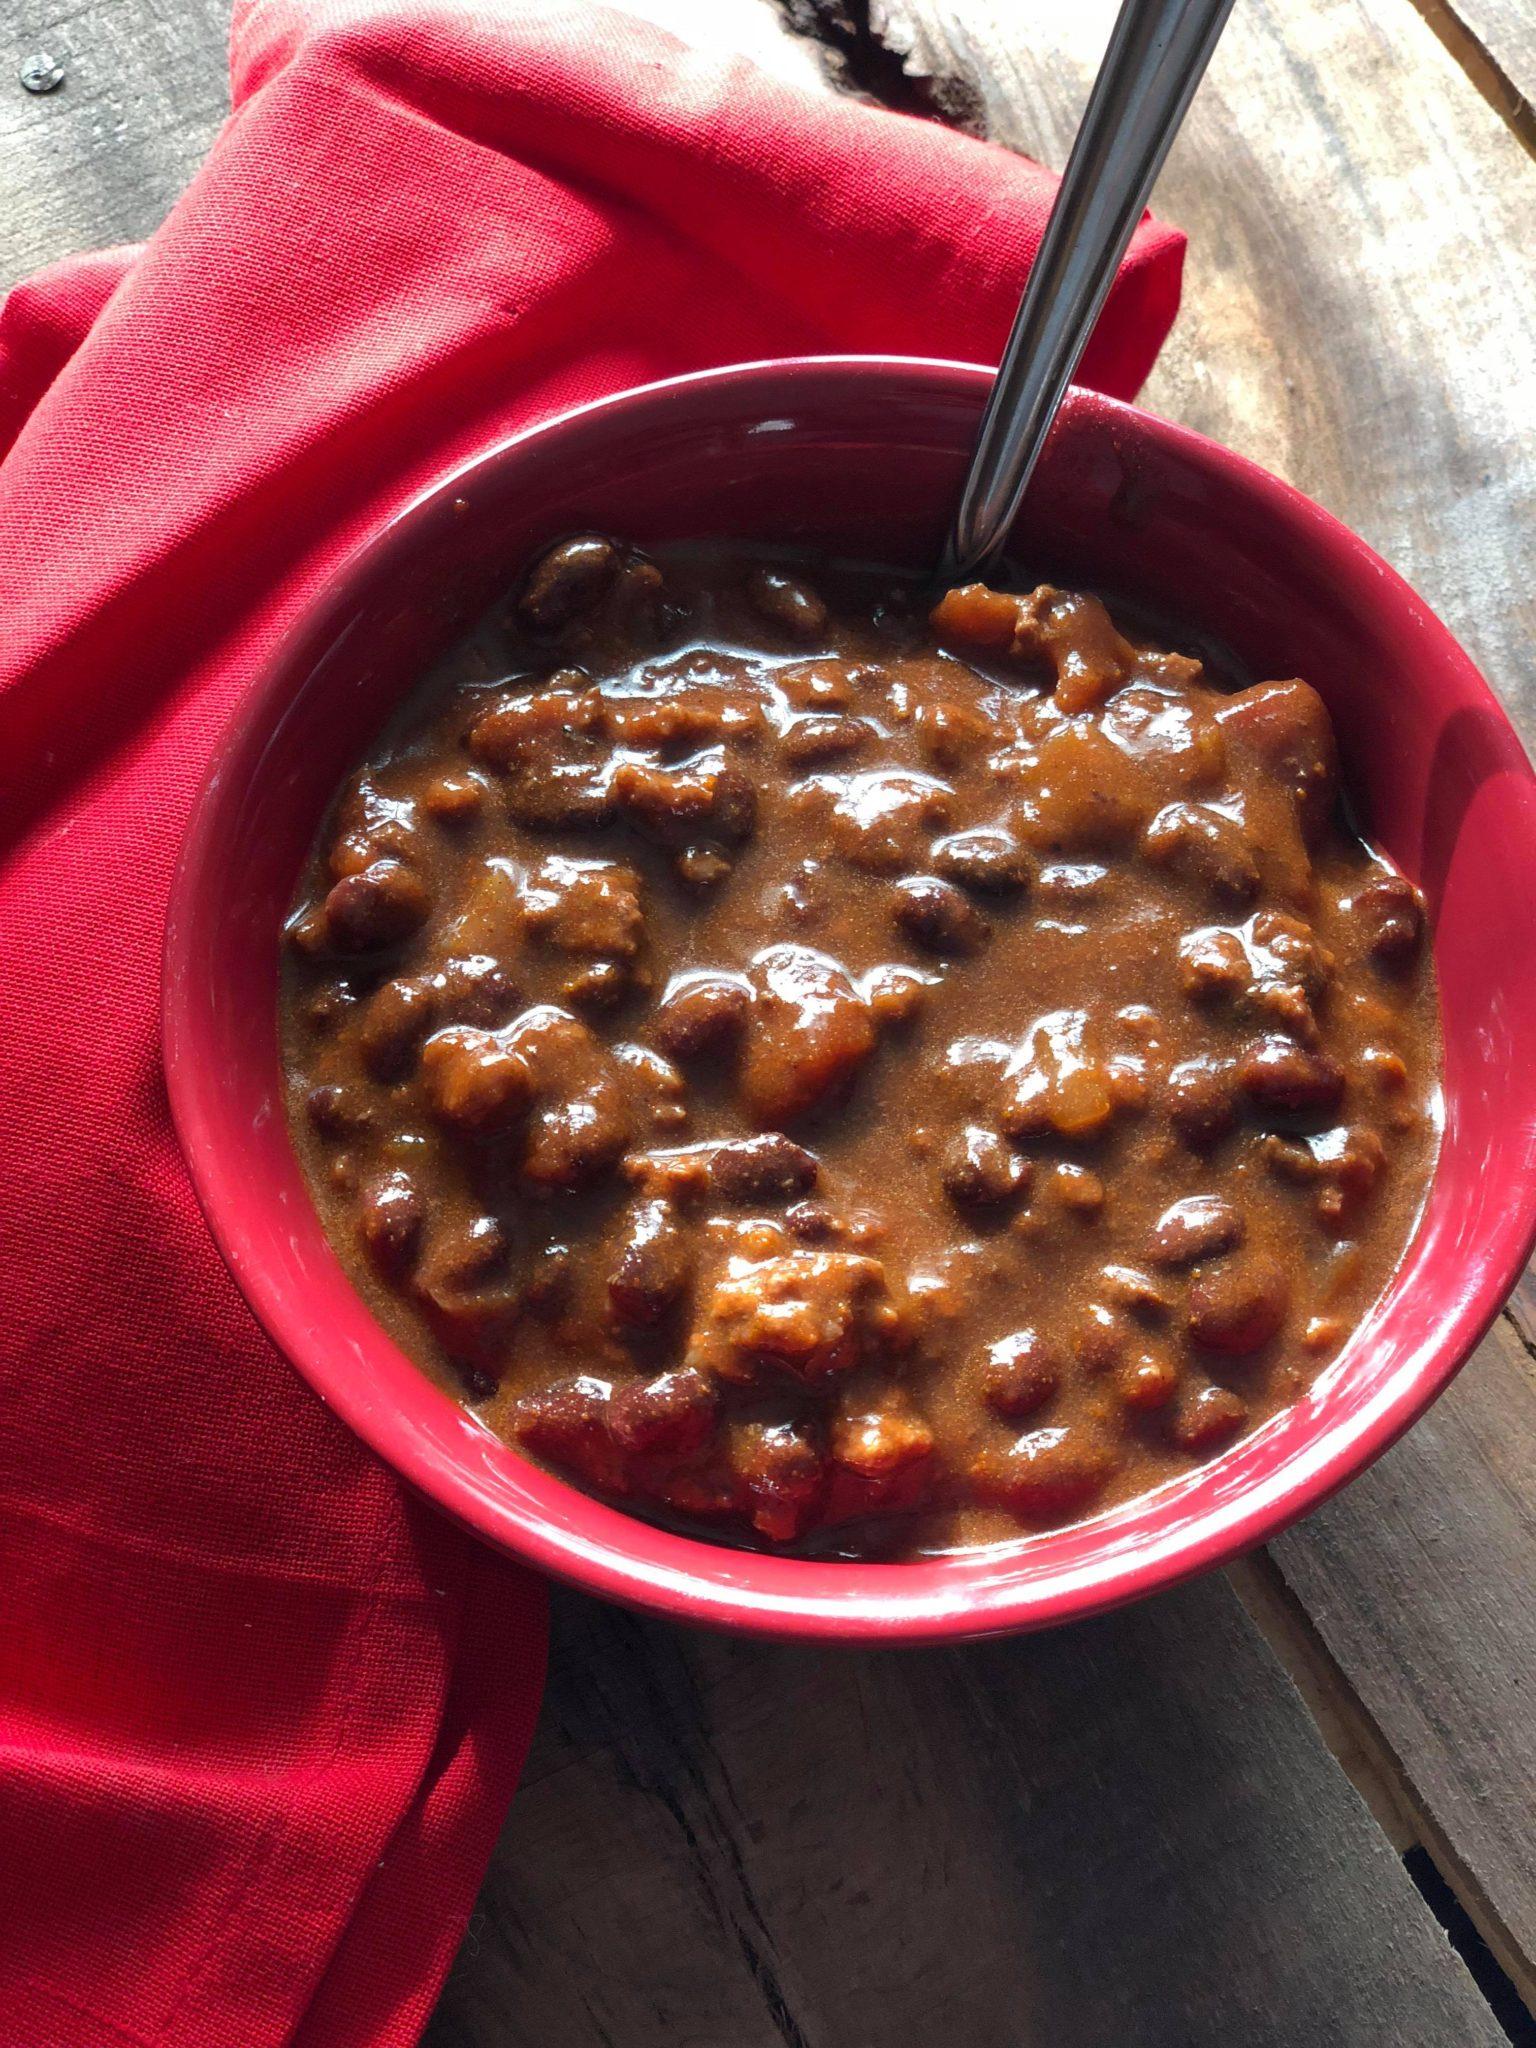 Wintry Day Chili Recipe